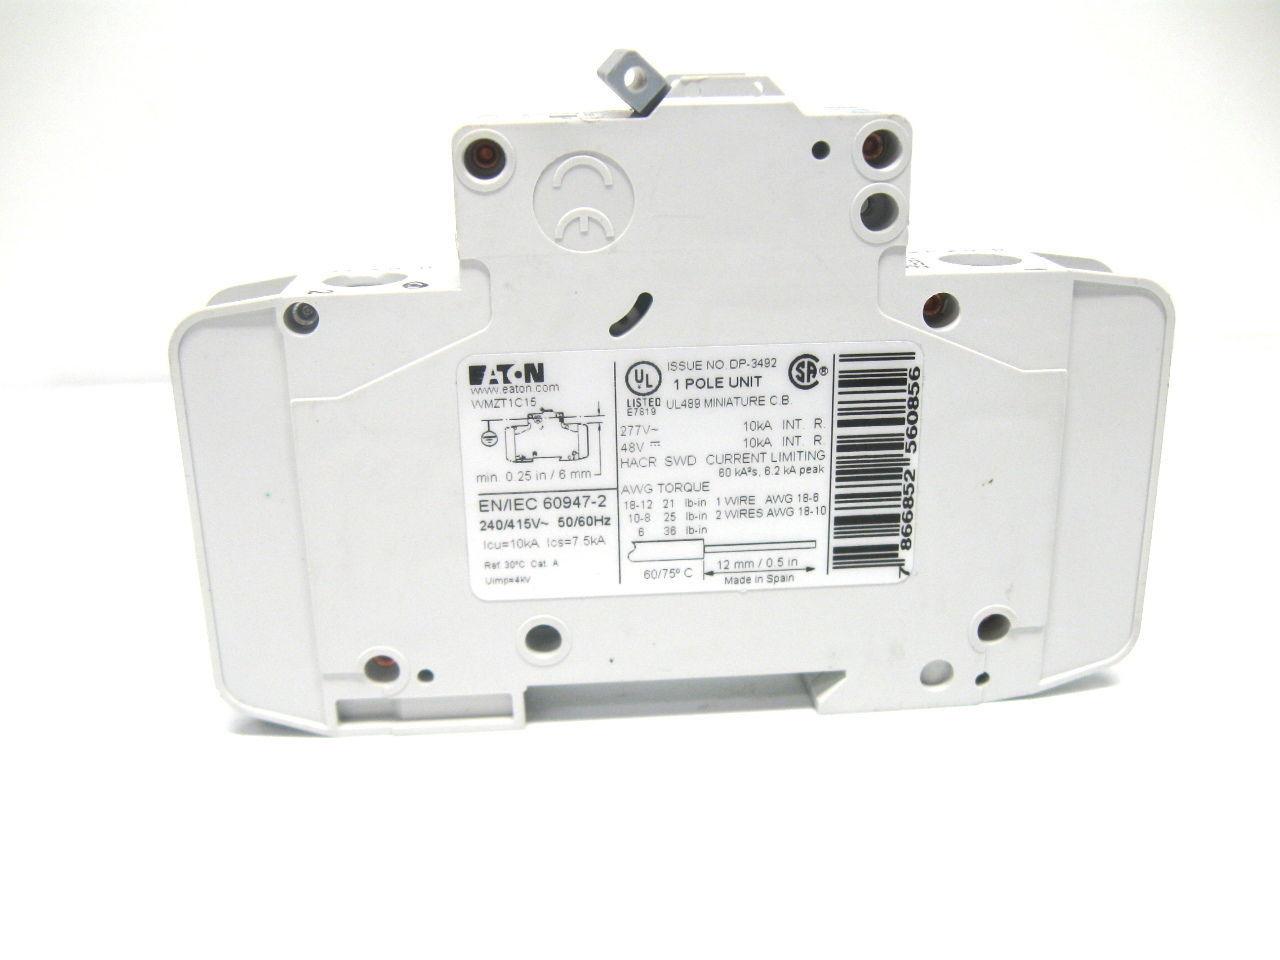 Eaton Wmzt1c15 Circuit Breaker 15 Amp 1 And 50 Similar Items Faz Miniature Breakers Pole 277 V